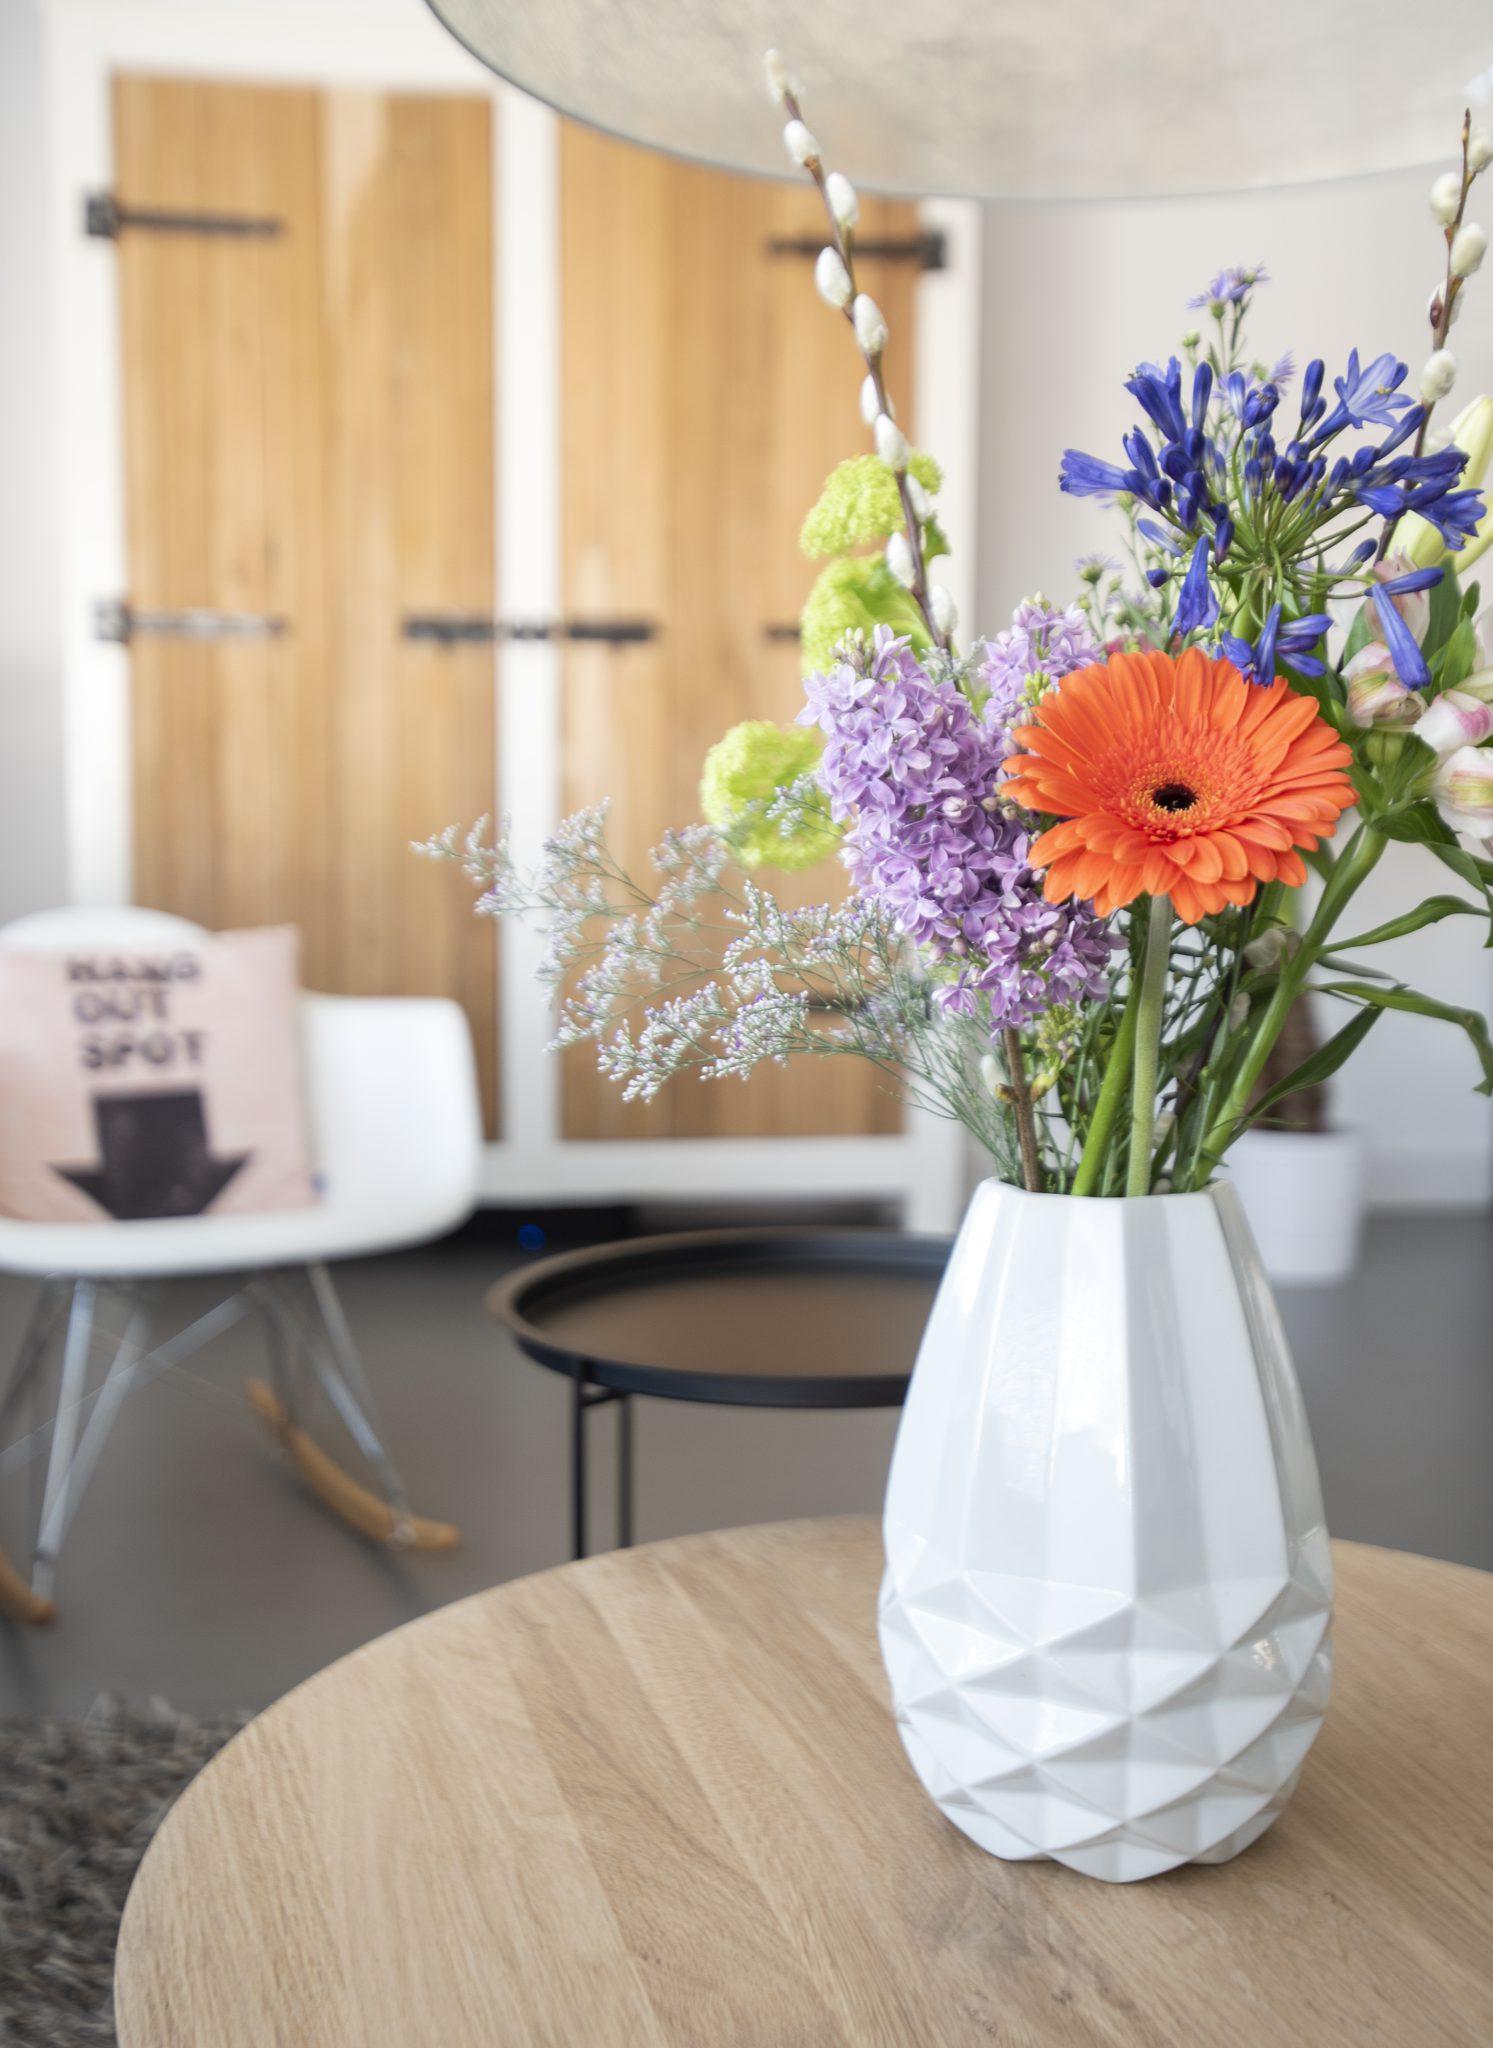 bloemen_sfeer_interieur_huiskamer_styling